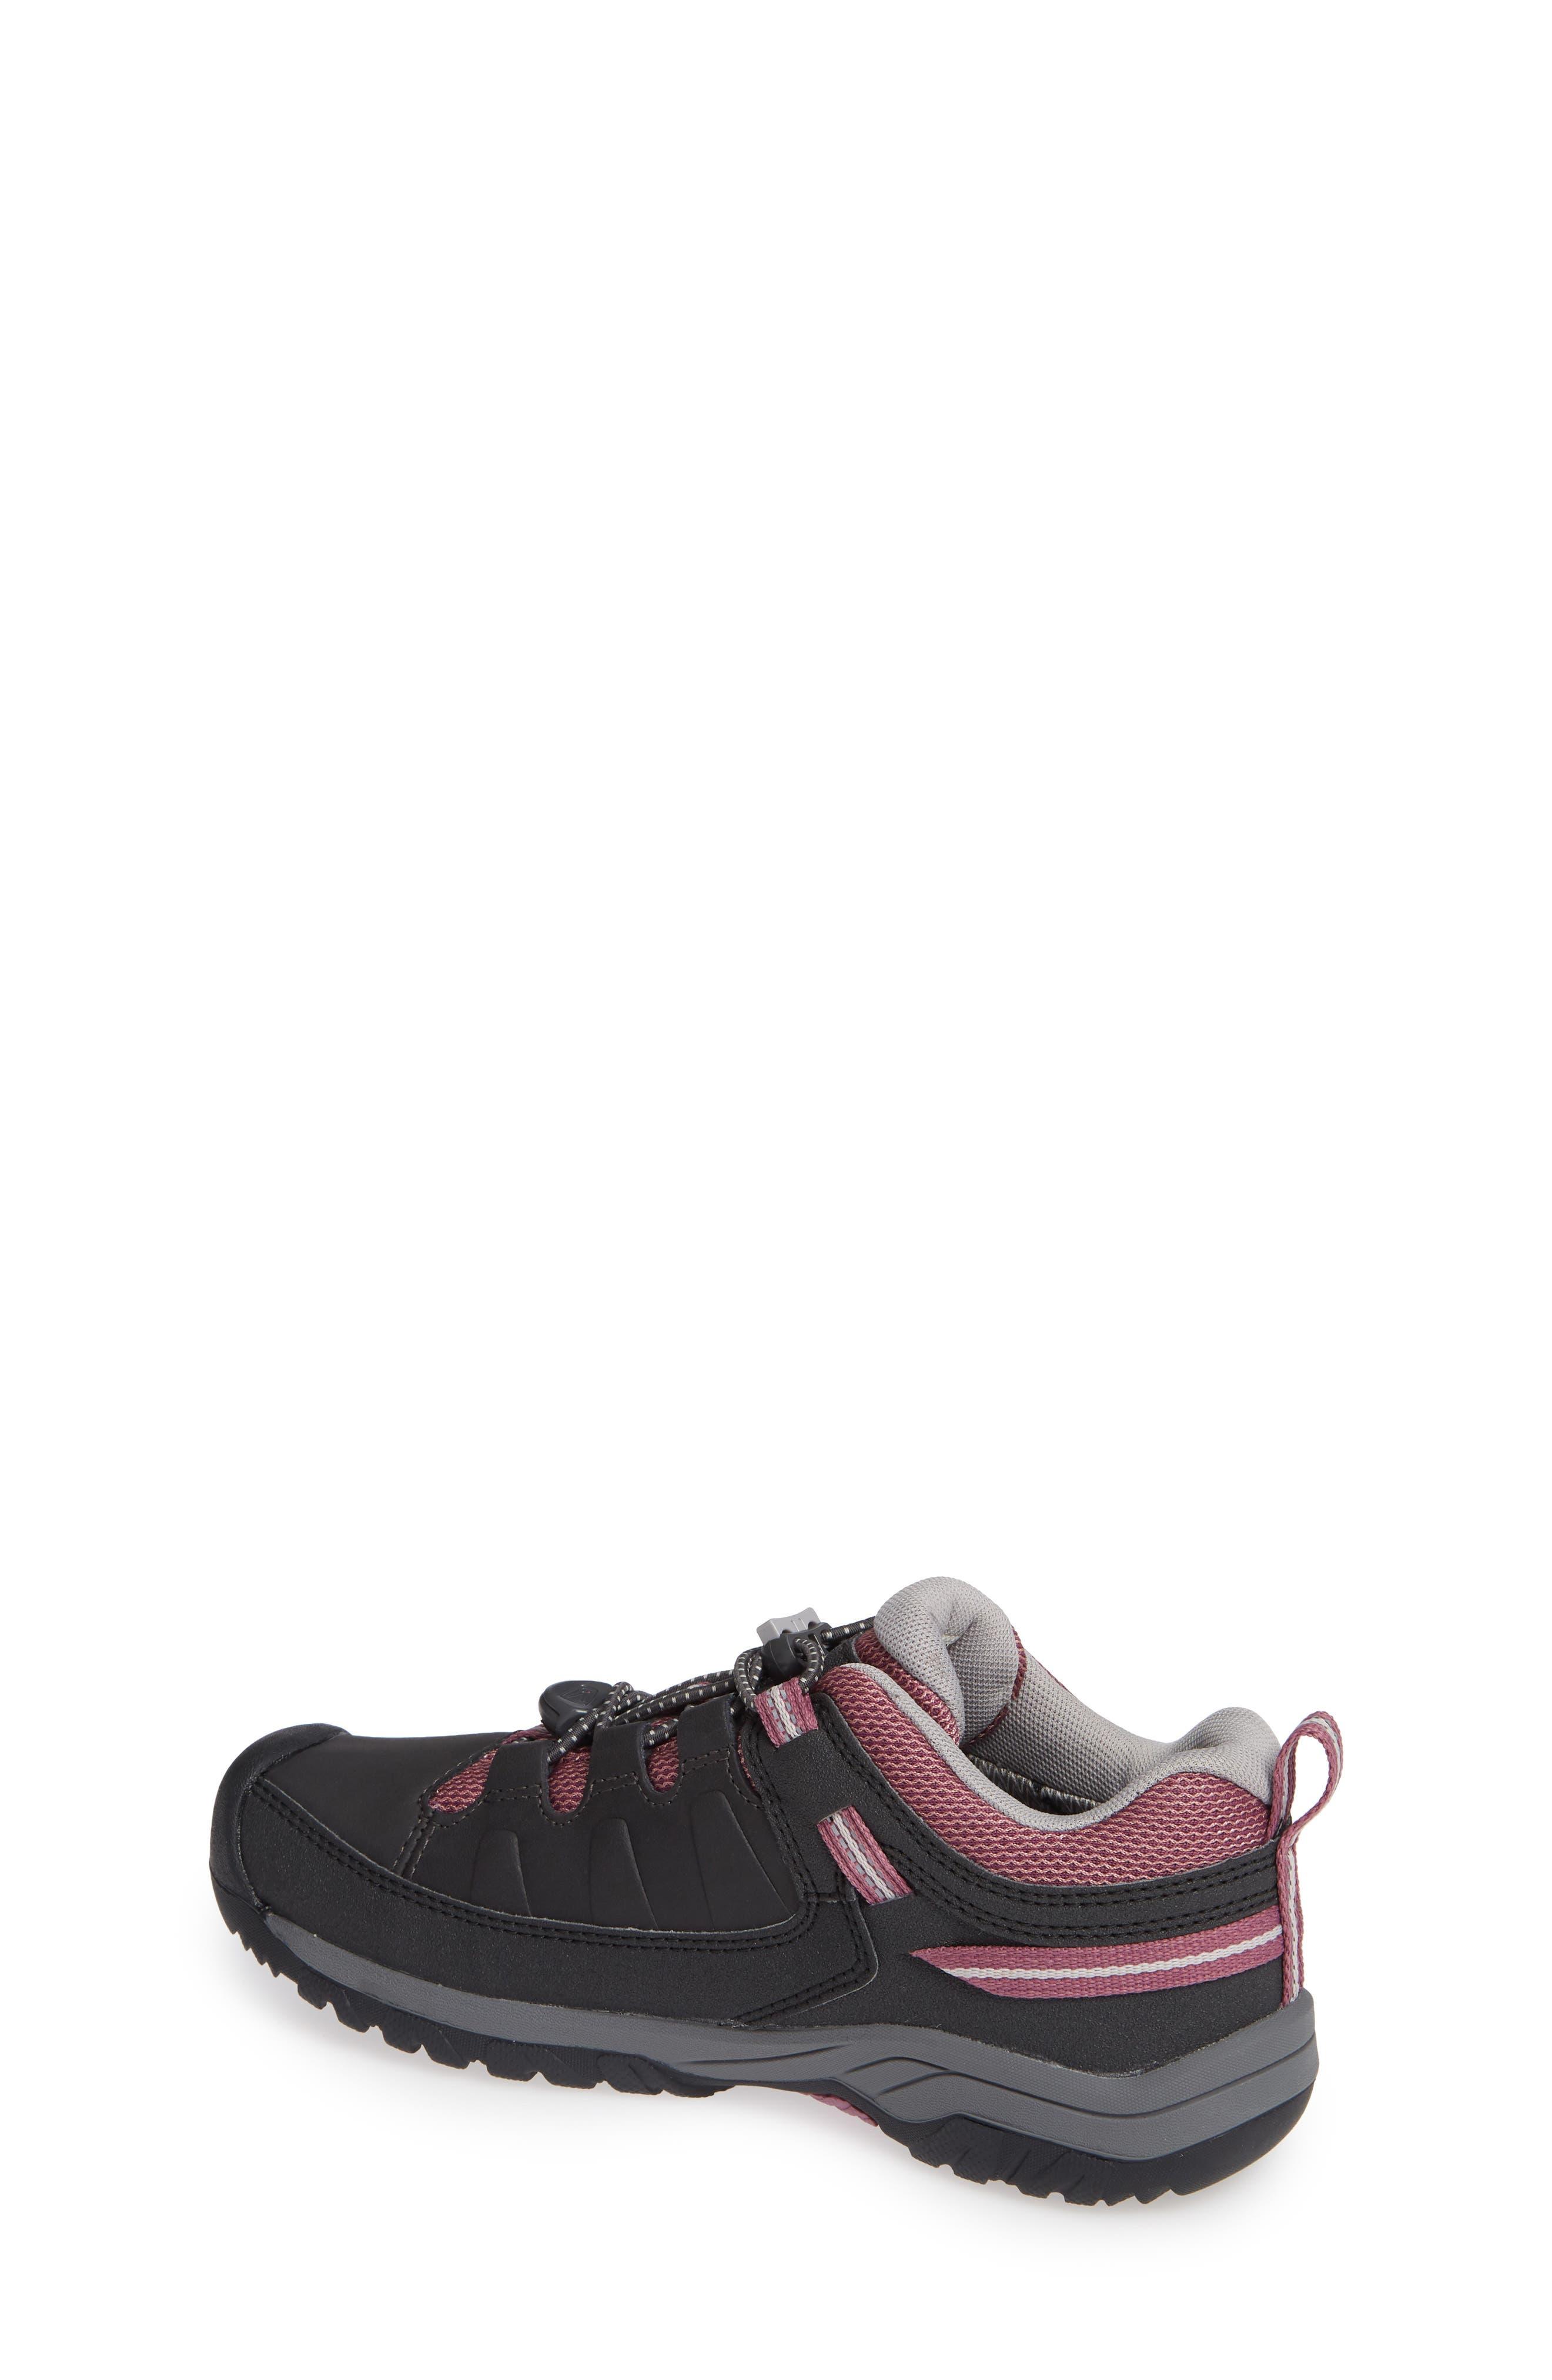 Targhee Low Waterproof Boots,                             Alternate thumbnail 2, color,                             RAVEN/ TULIPWOOD/ TULIPWOOD